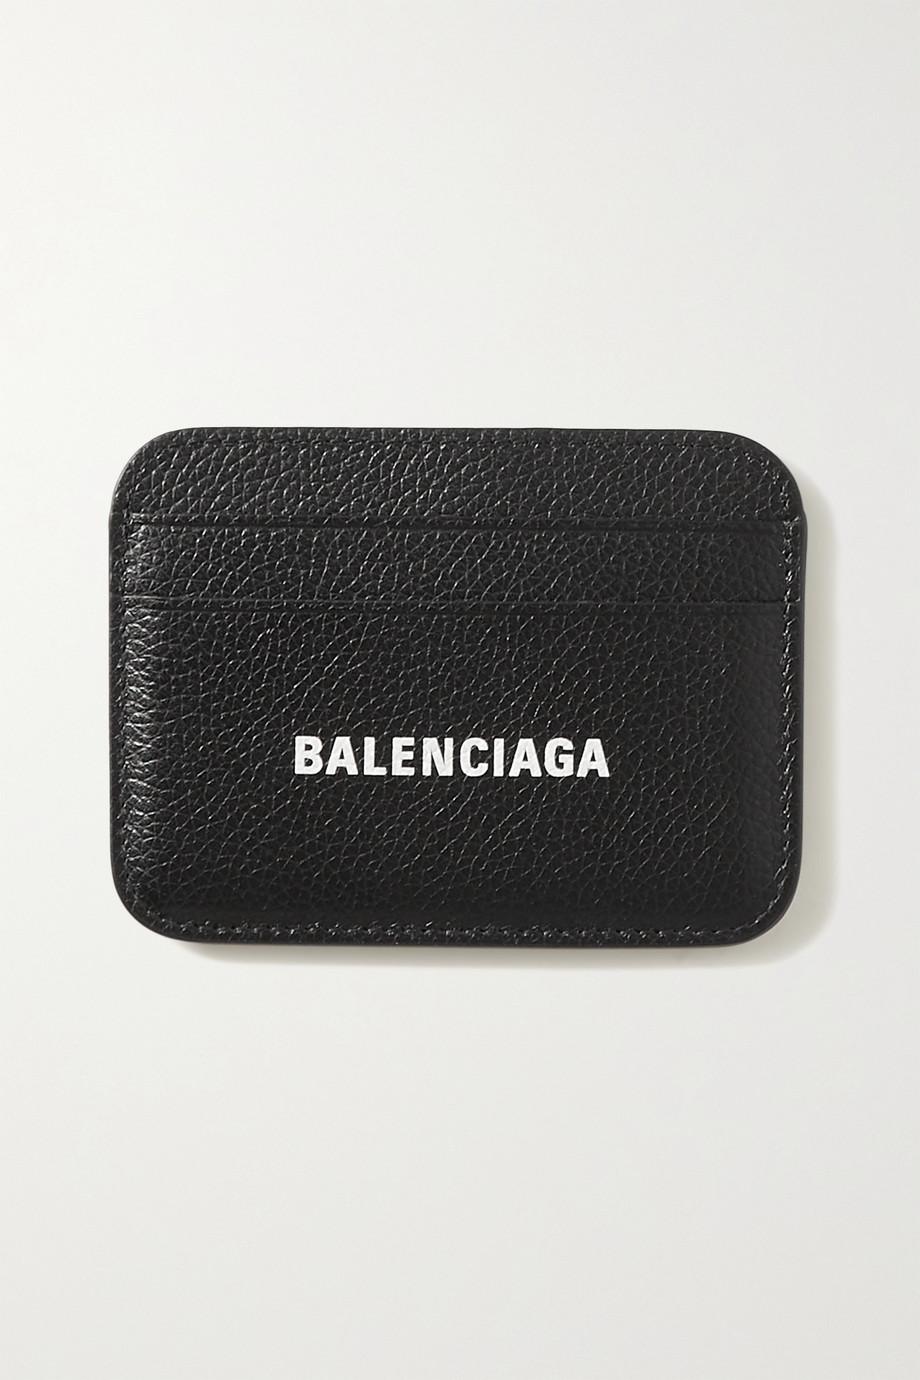 Balenciaga Cash printed textured-leather cardholder